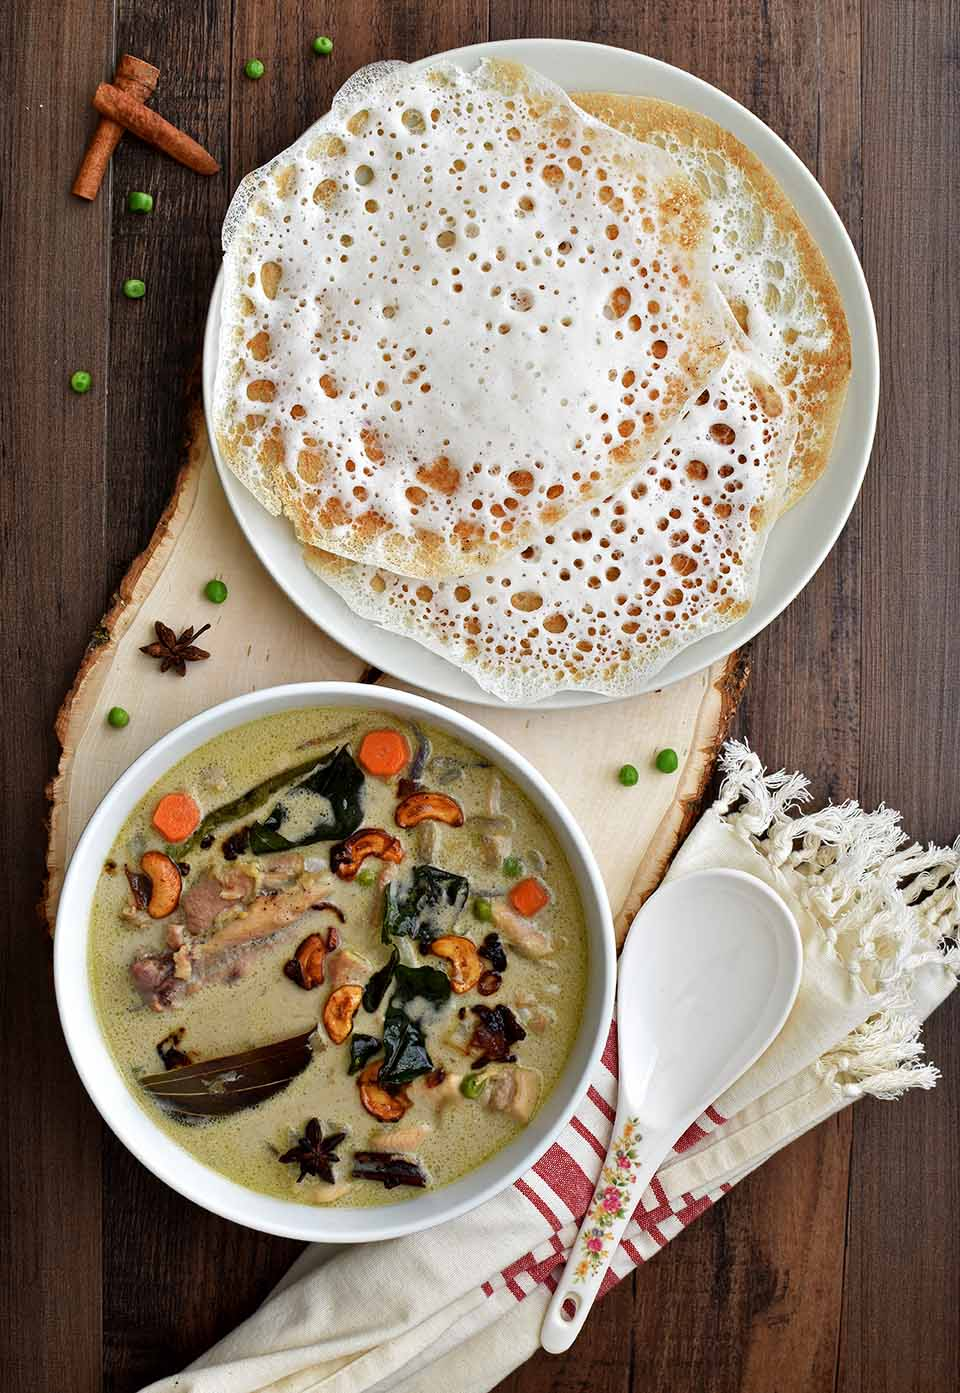 Chicken Stew - Pepper Delight #recipe #stew #thanksgiving #newyear #chickenstew #keralarecipes #easter #christmas #holidayrecipes #party #festivals #keralachickenstew #ishtu #glutenfree #christianrecipes